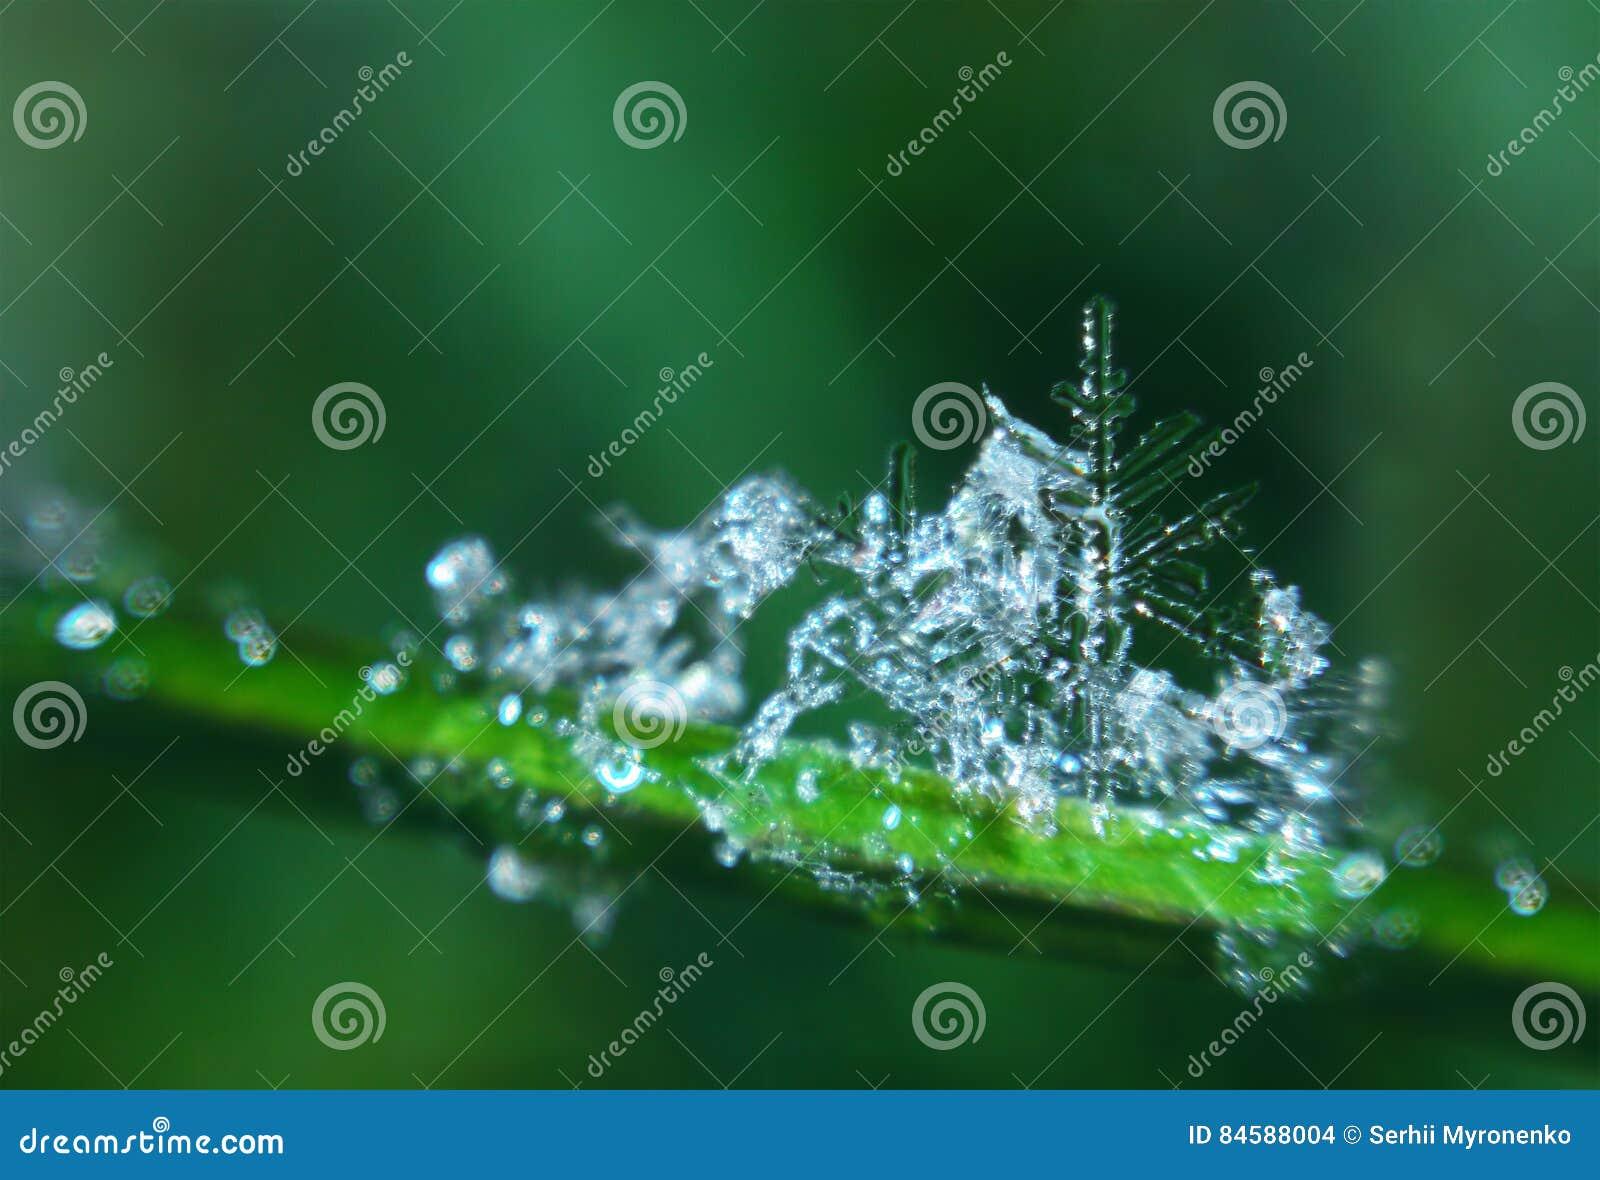 Snowflake like green christmass tree melting